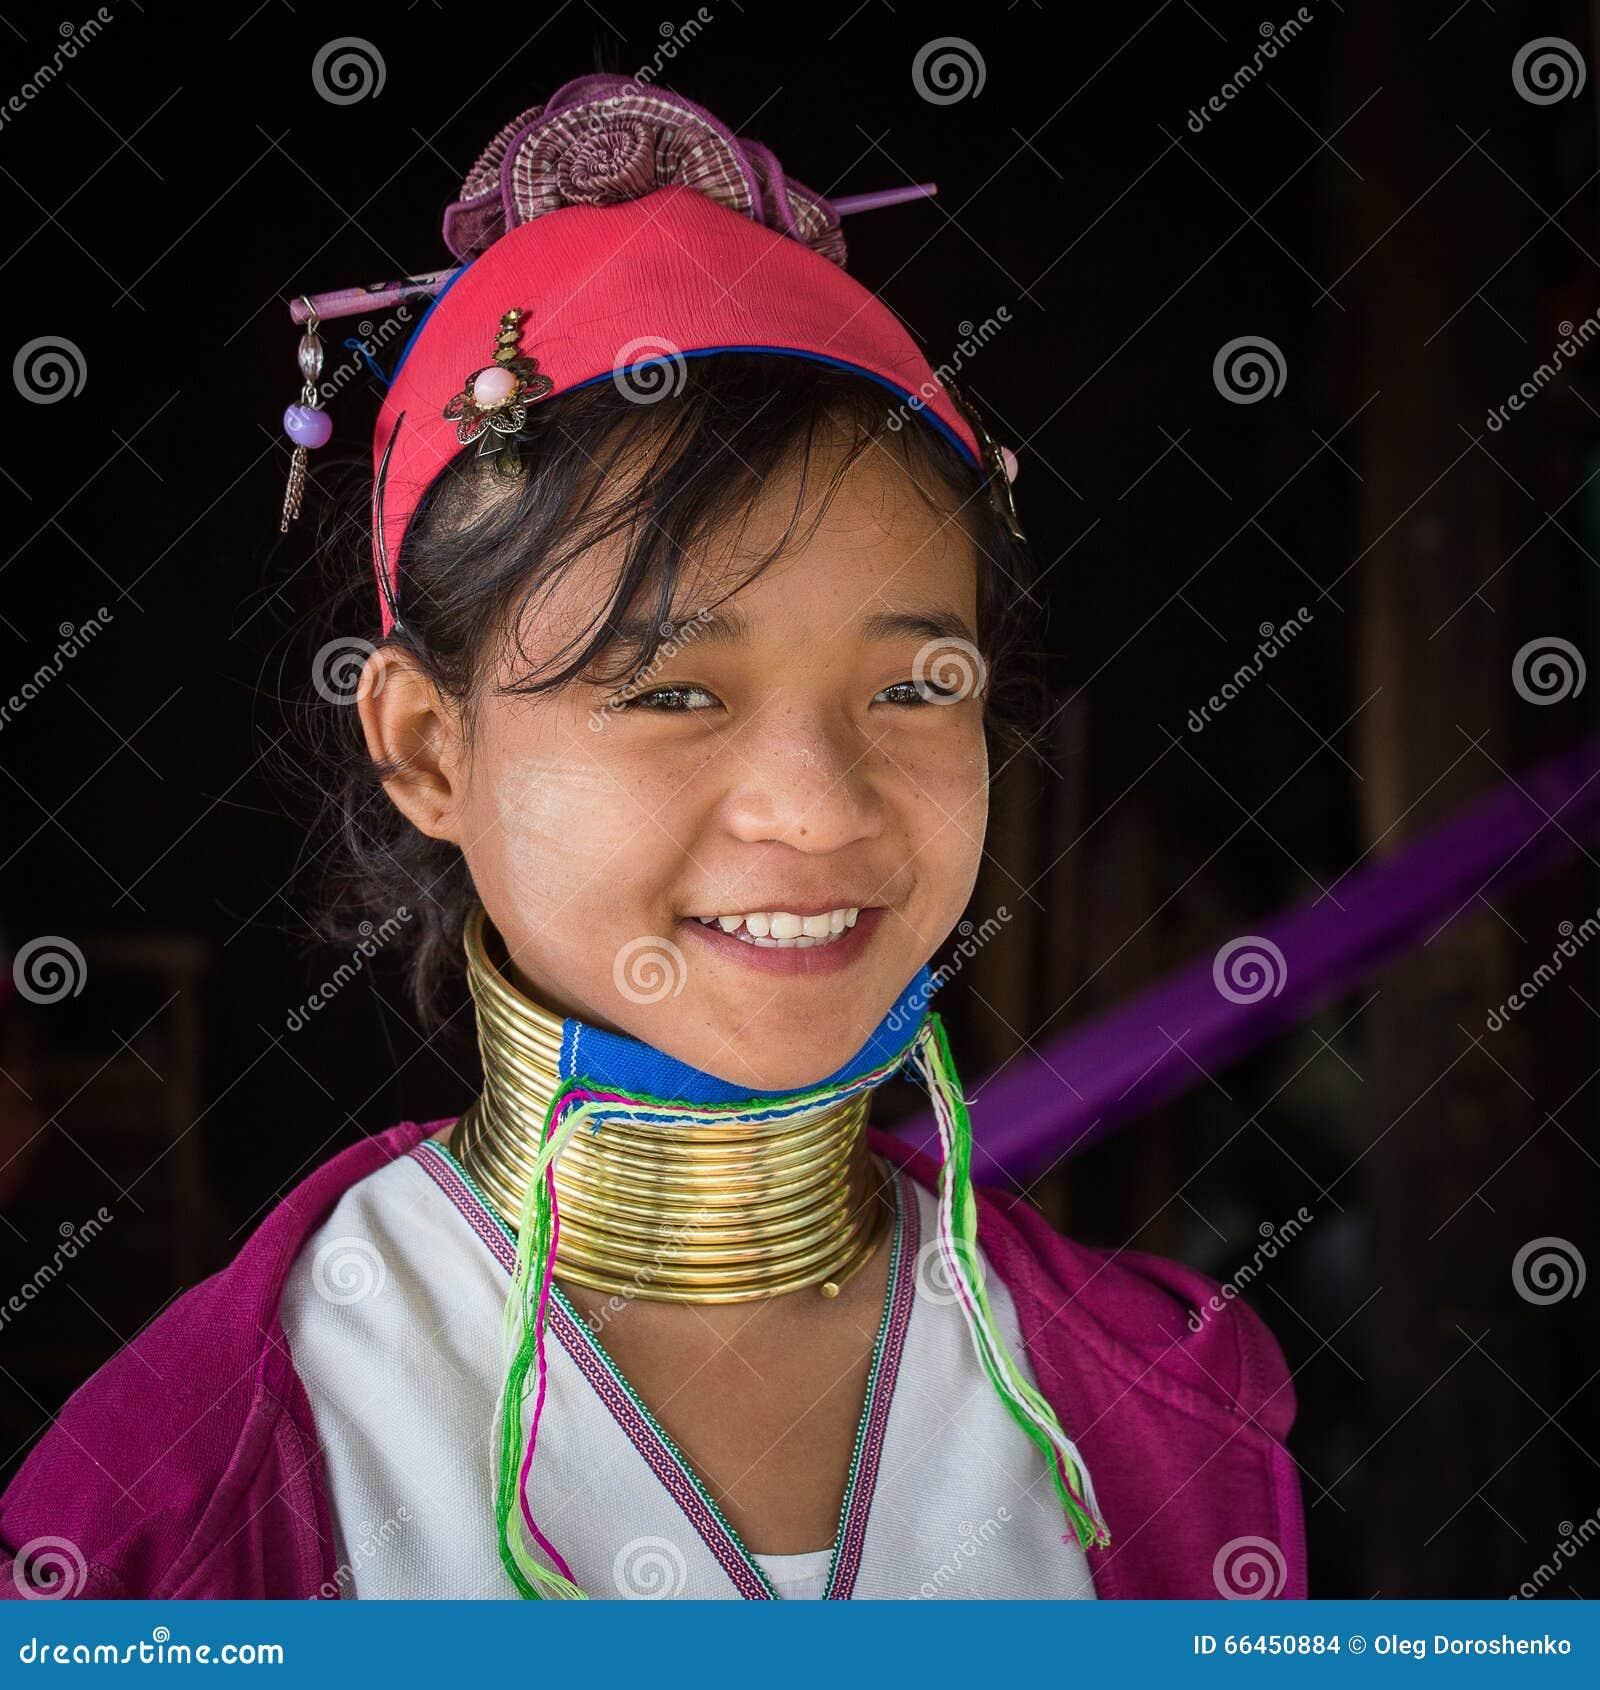 Necked girl videos in myanmar, ebony anal gape pics